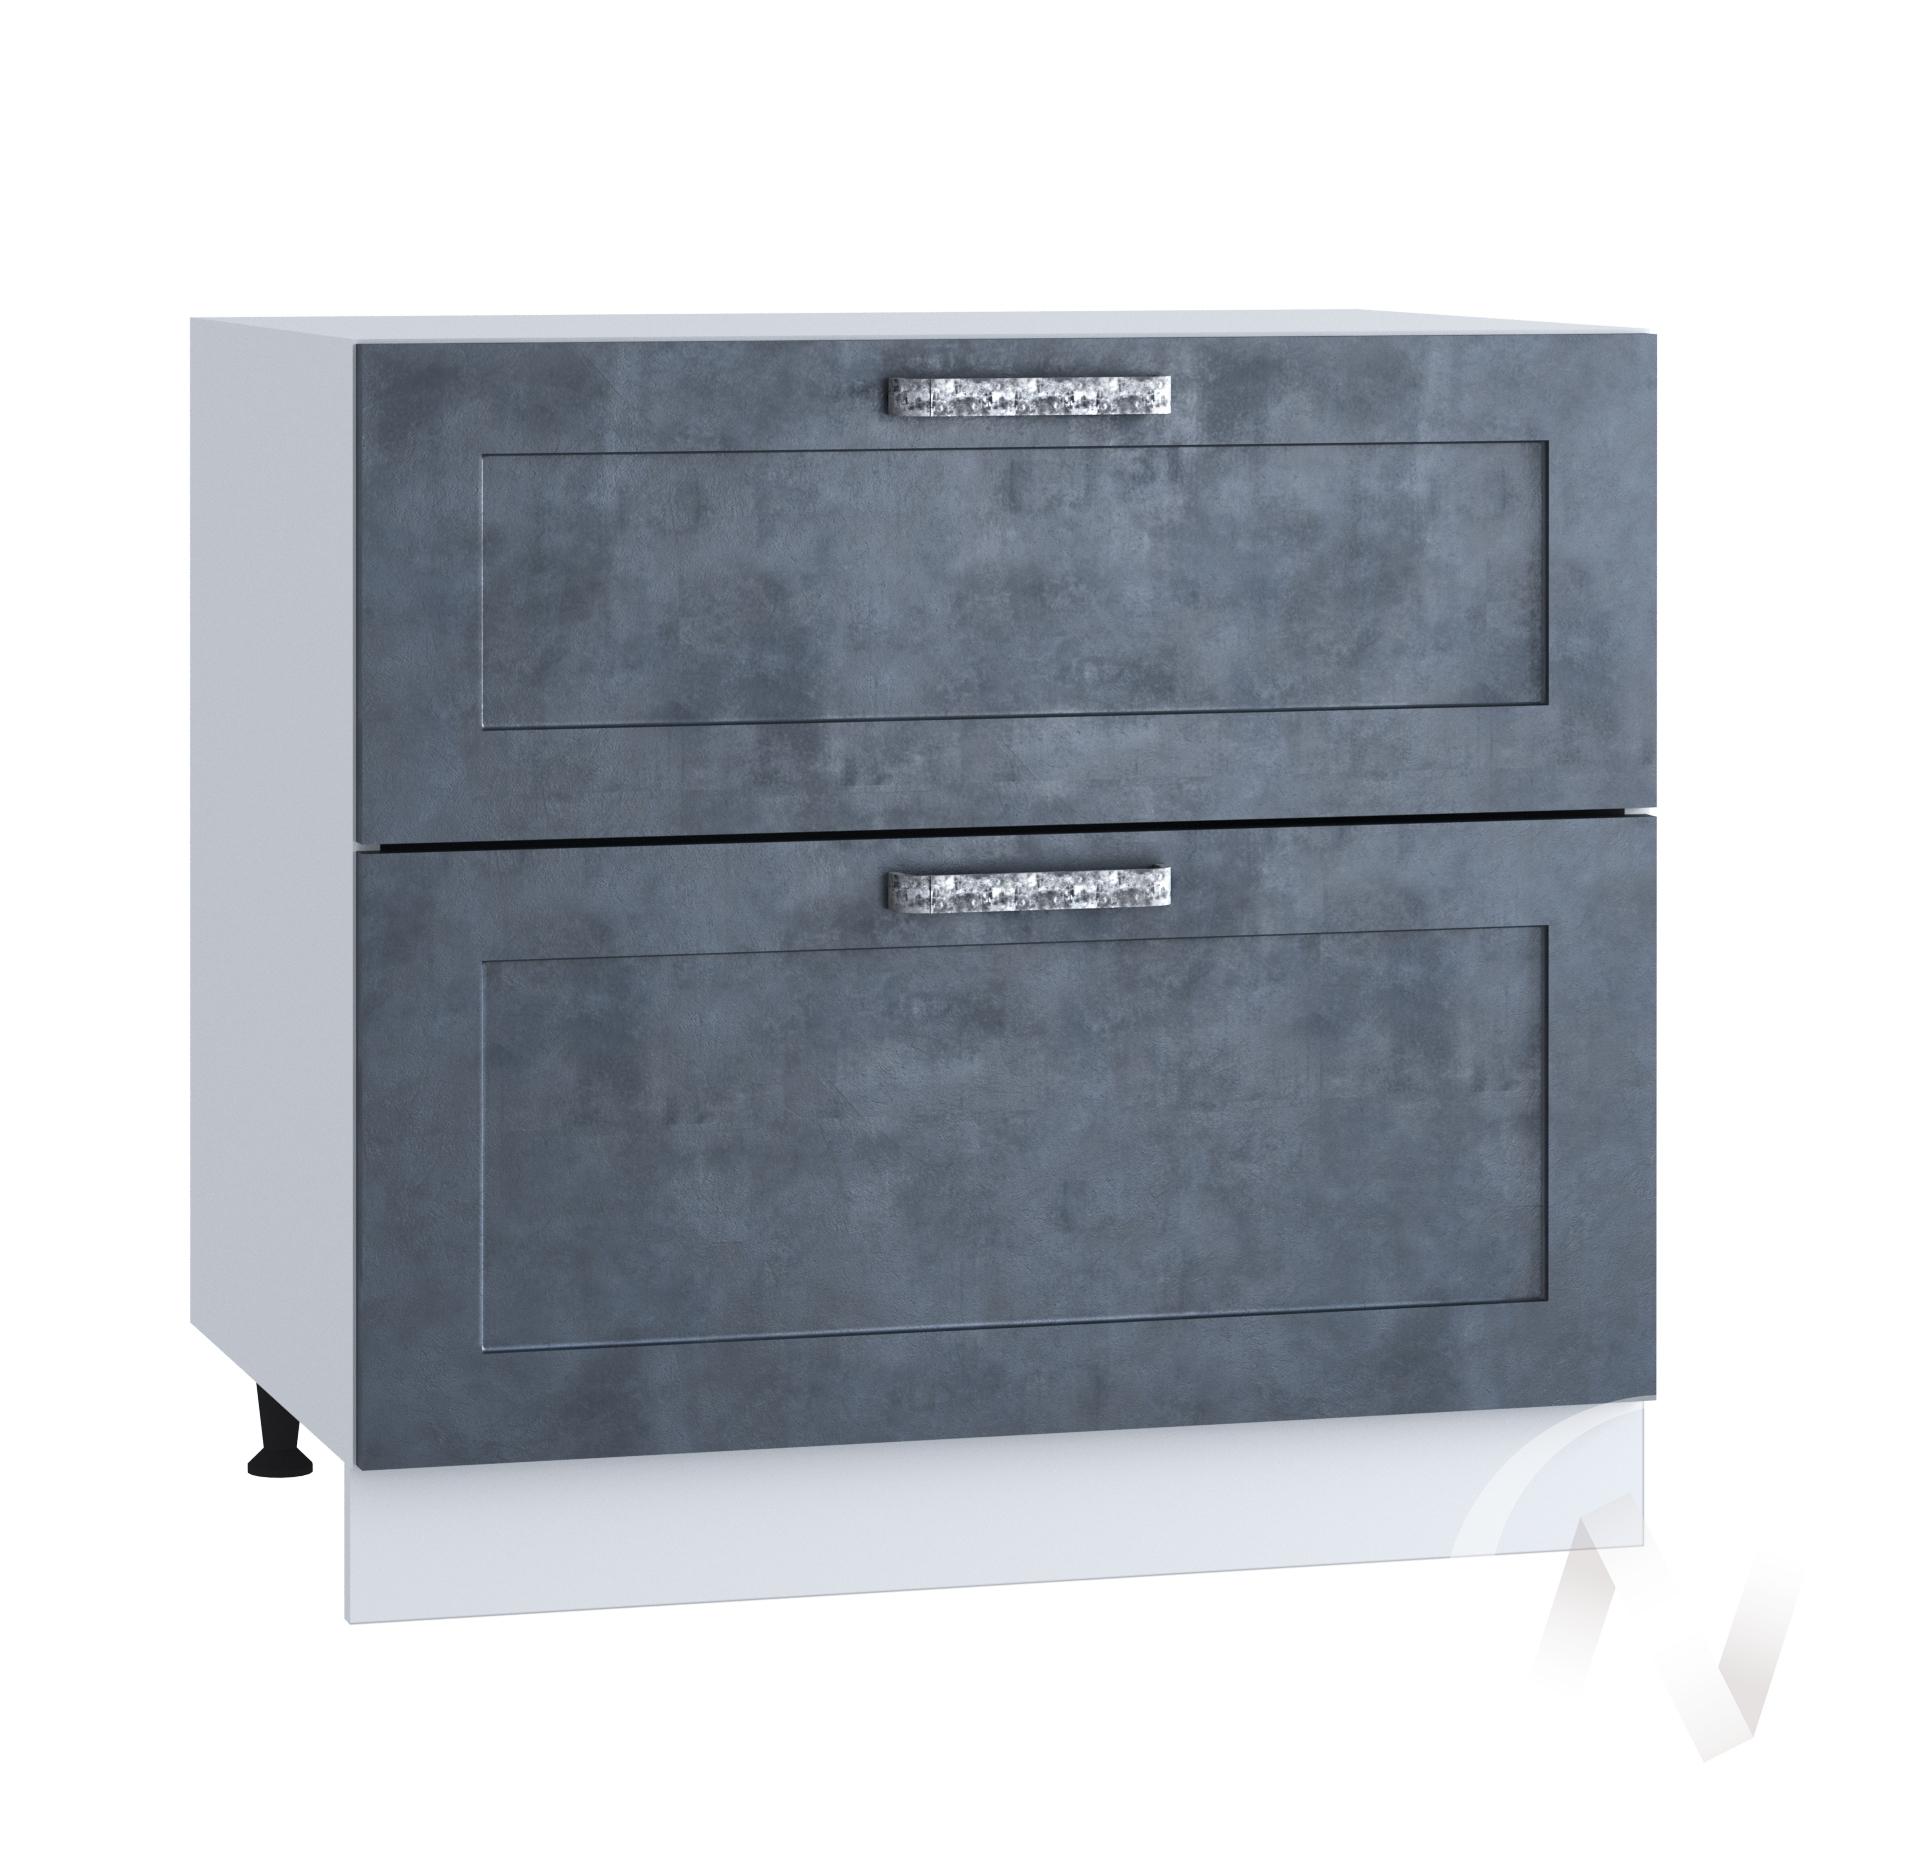 "Кухня ""Лофт"": Шкаф нижний с 2-мя ящиками 800, ШН2Я 800 (Бетон графит/корпус белый)"